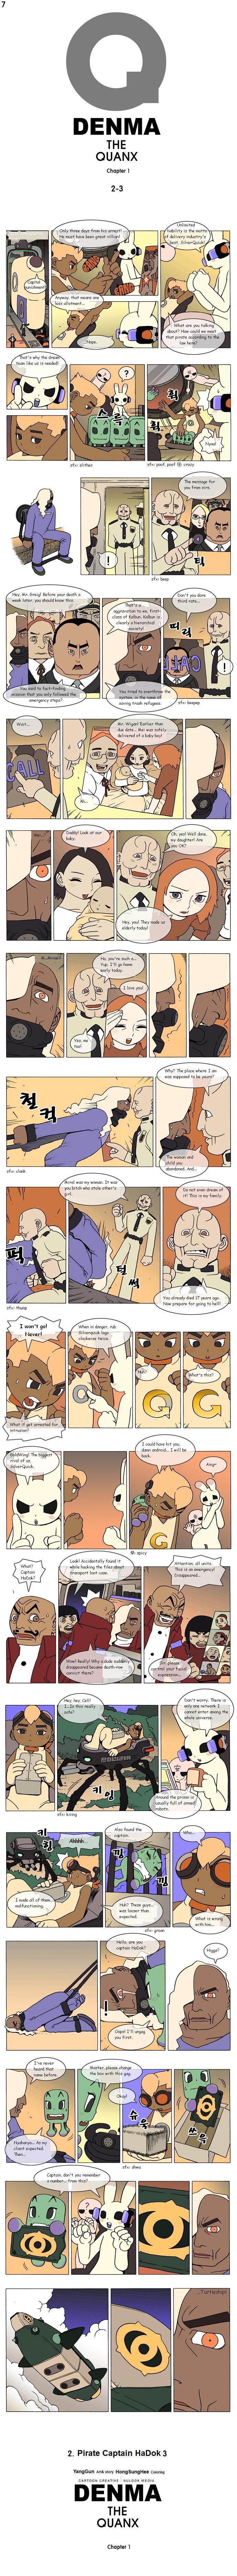 Denma 7 Page 1